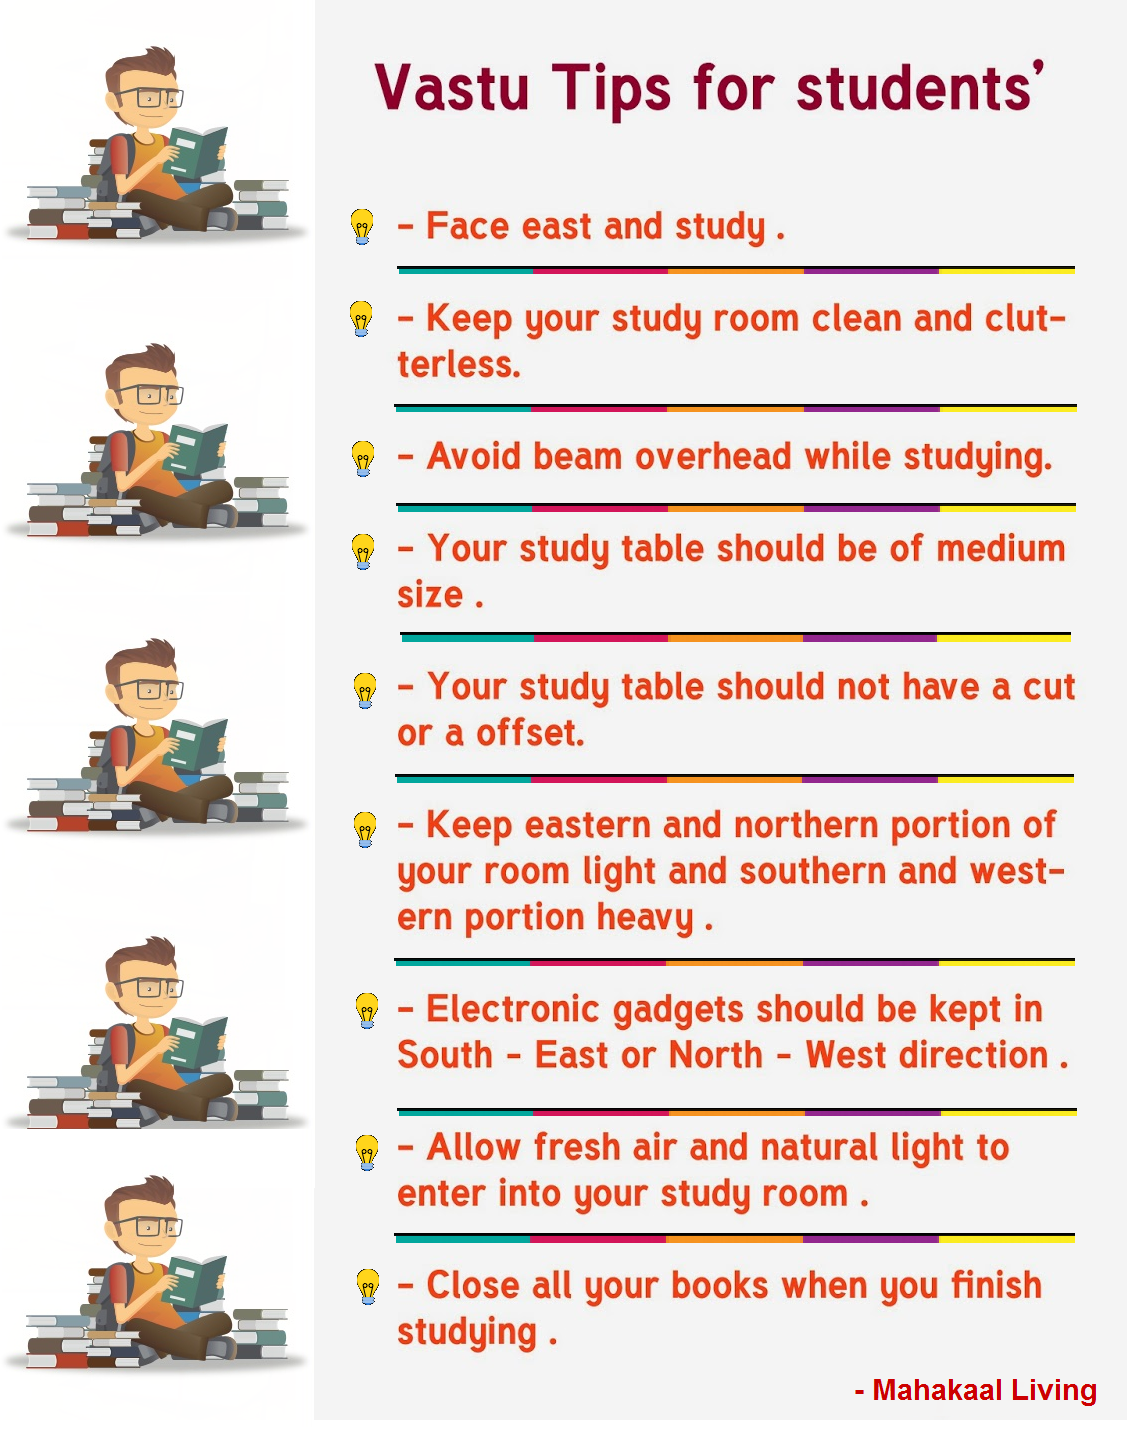 Vastu Tips For Students Improve Performance